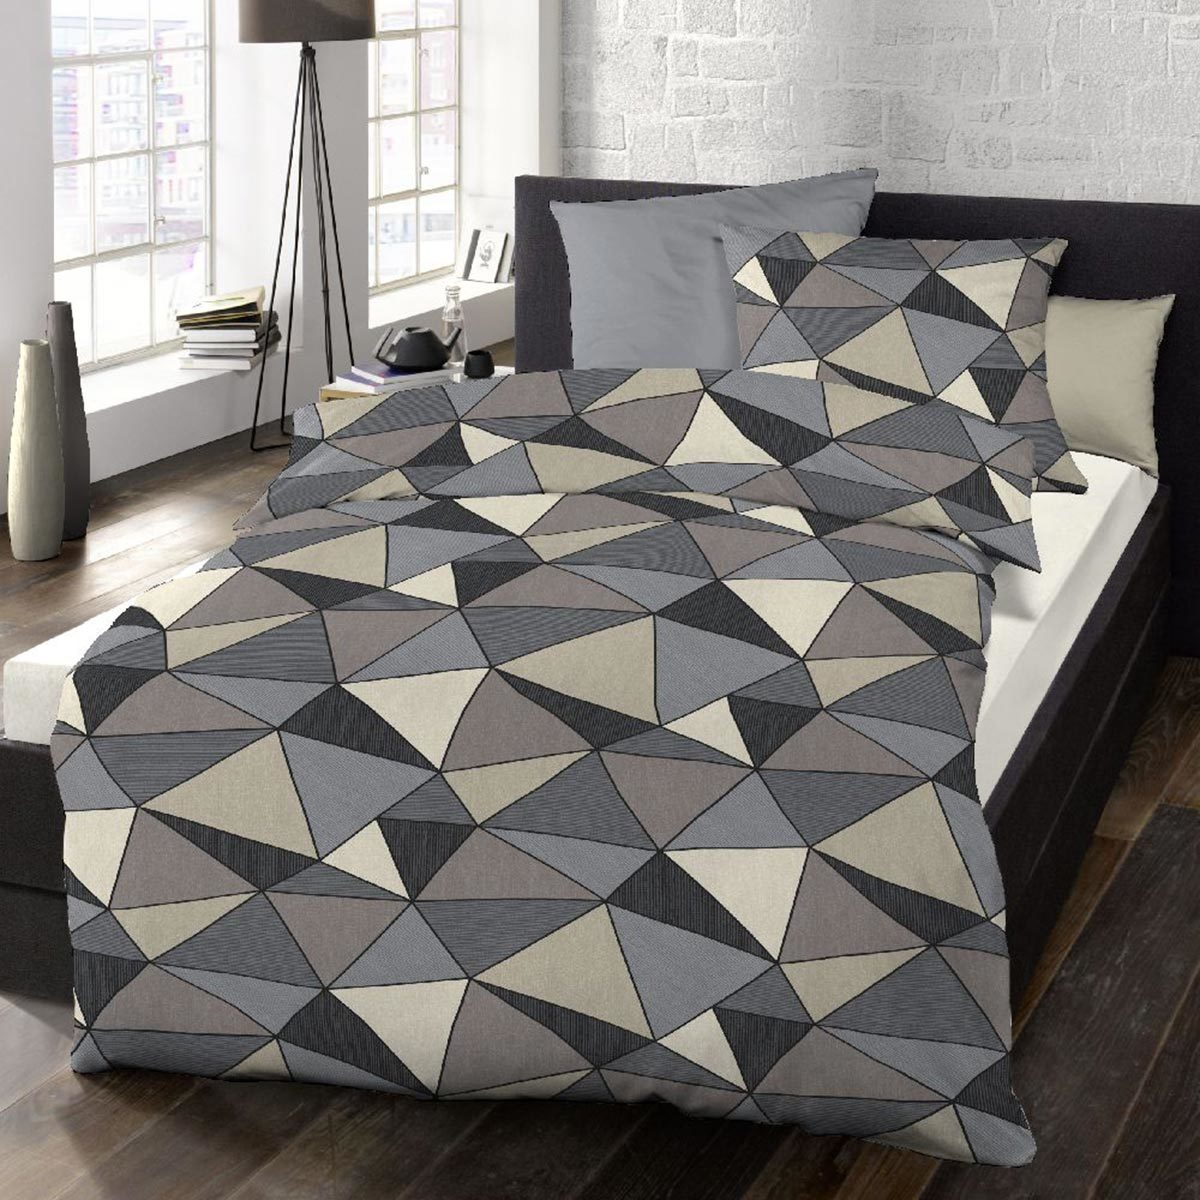 schlafgut soft touch cotton bettw sche chip smoky tiffany. Black Bedroom Furniture Sets. Home Design Ideas